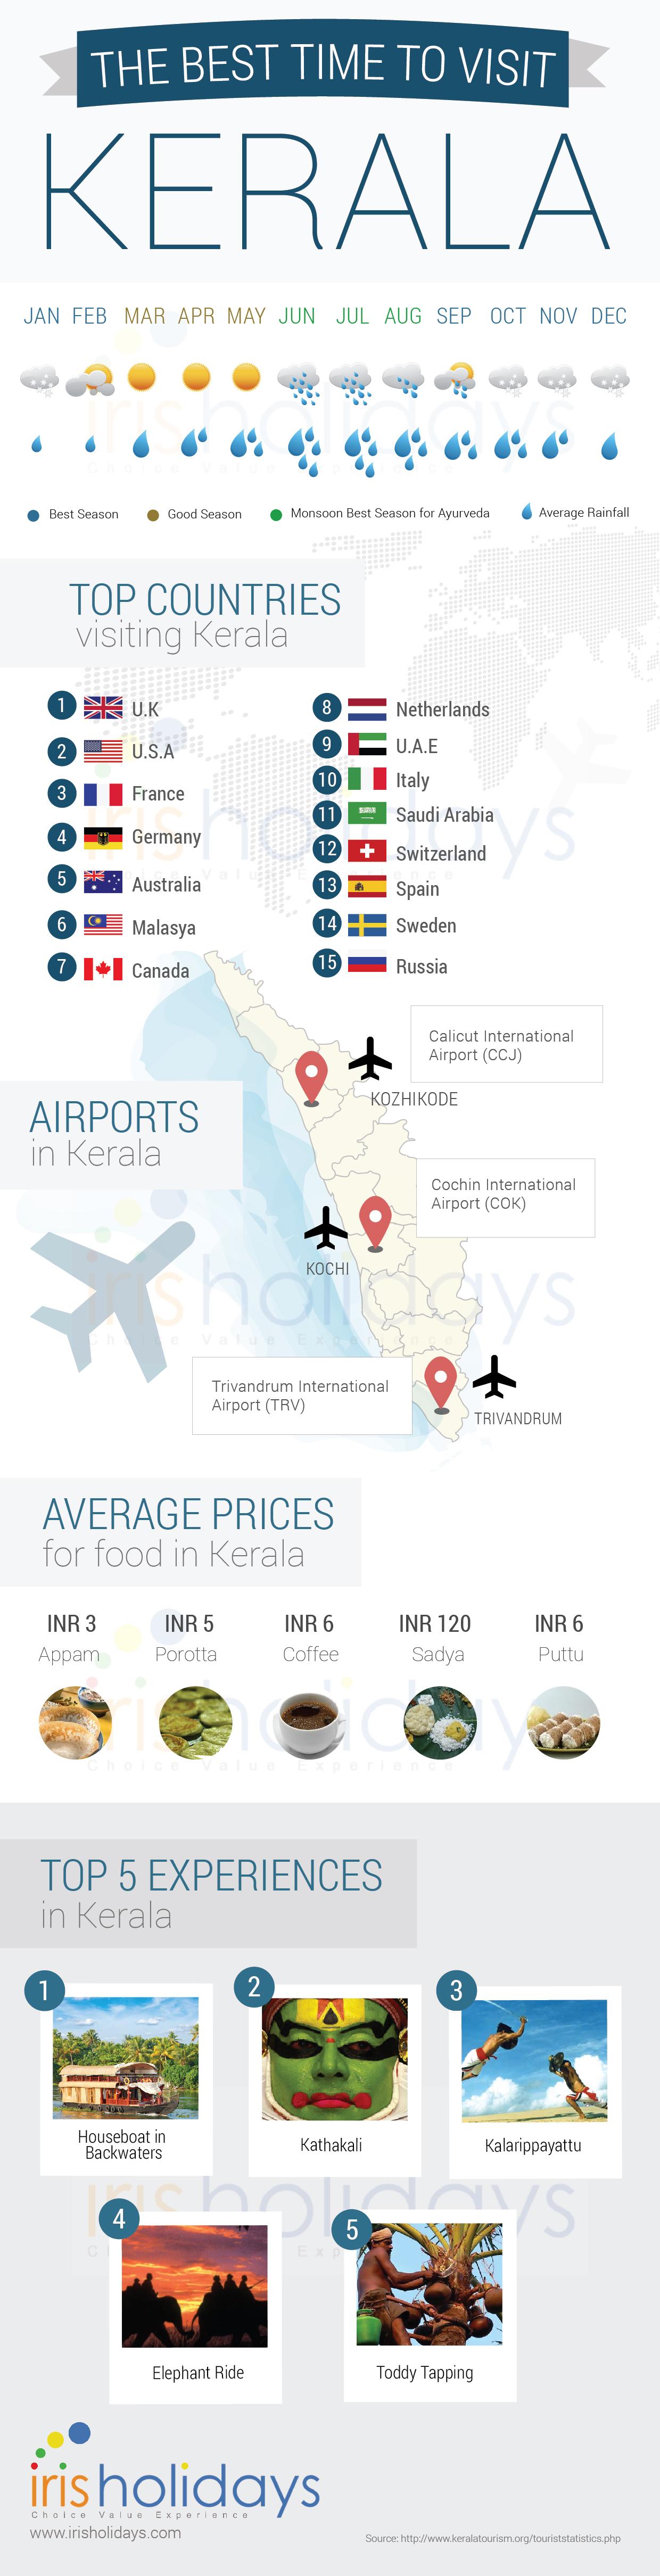 Best Season to Visit Kerala